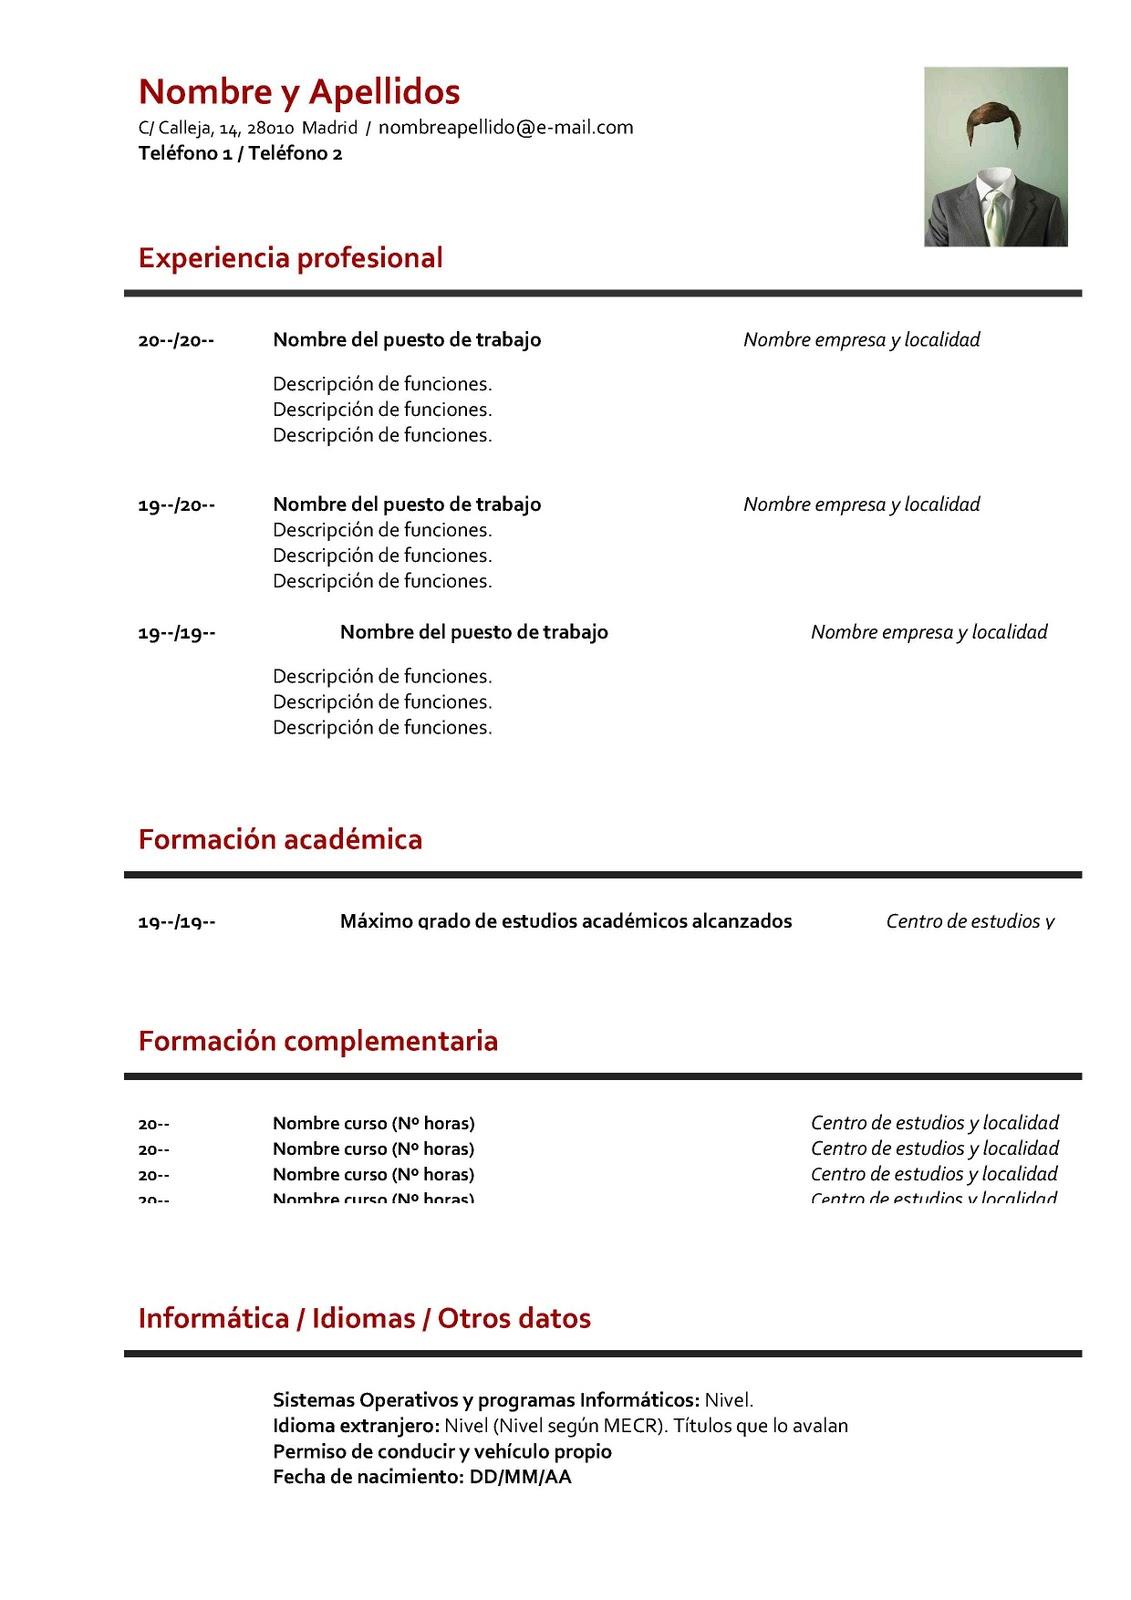 curriculum resumen ejemplo de plantilla de en ingles 01 150x150